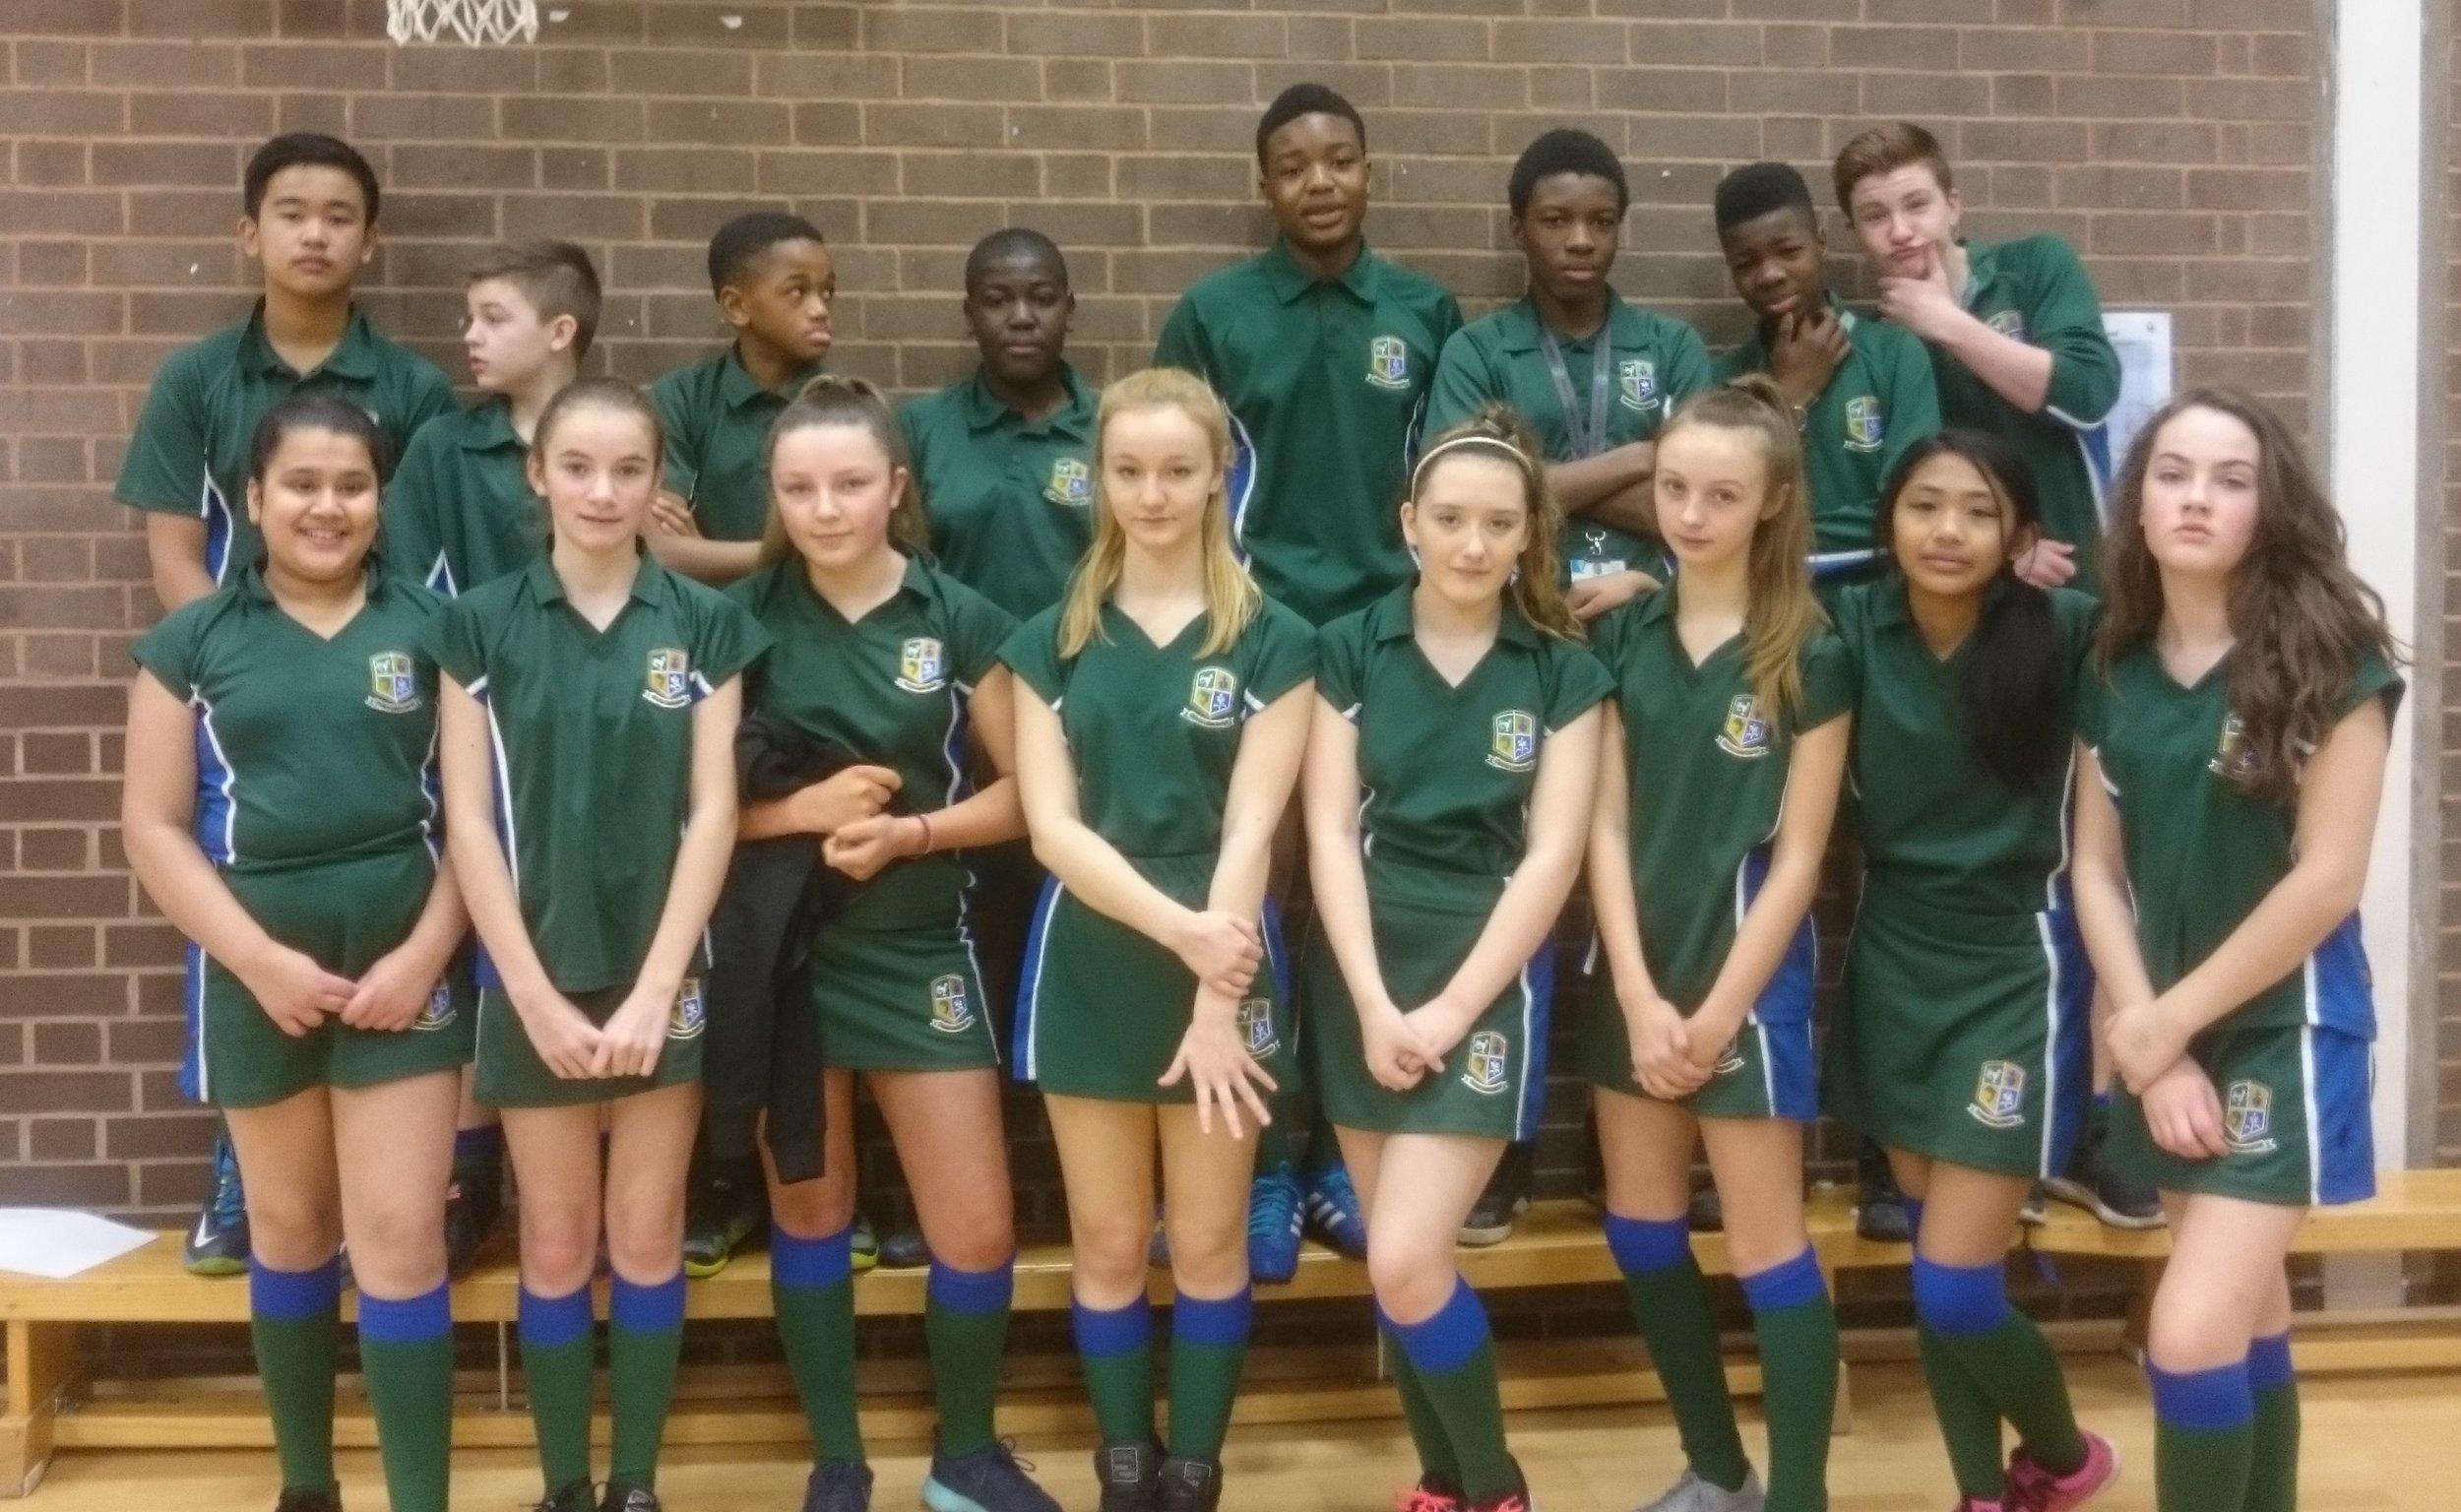 y7 netball team